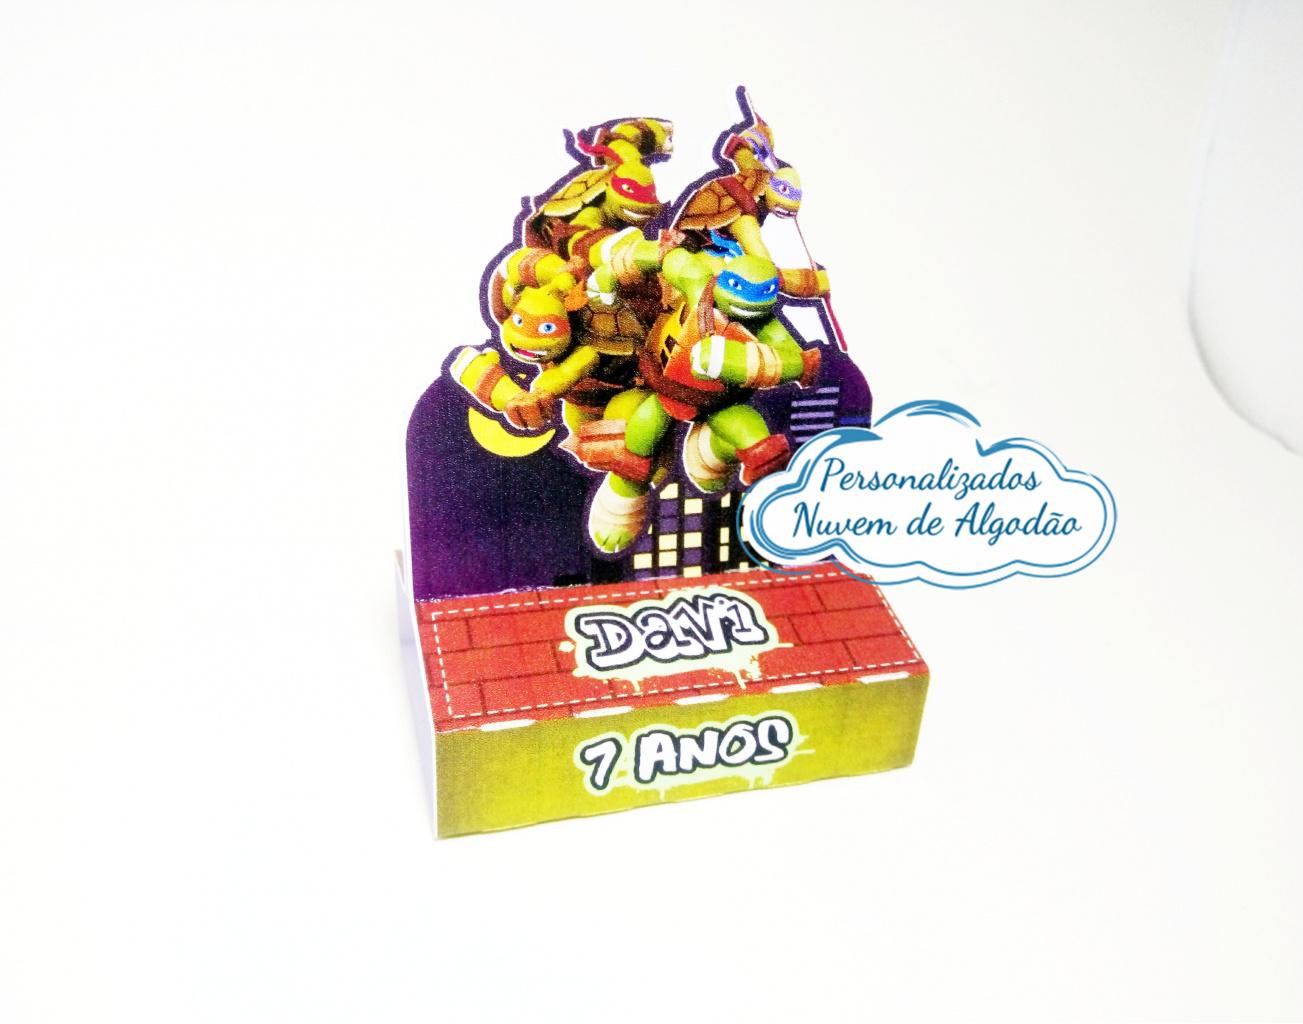 Nuvem de algodão personalizados - Porta bis duplo Tartarugas ninja